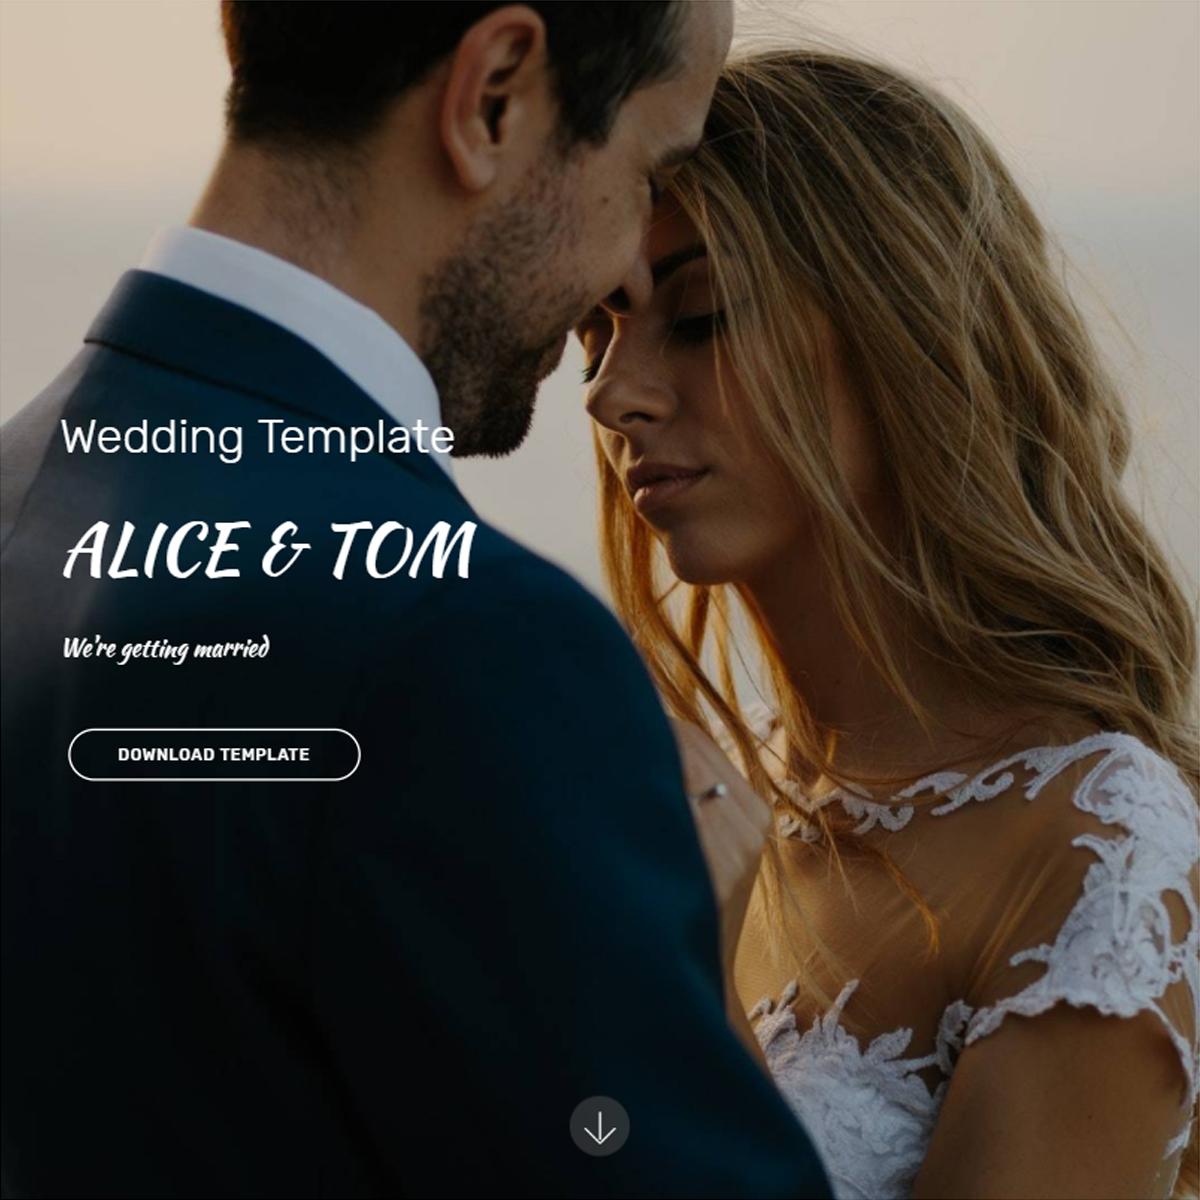 HTML5 Bootstrap Wedding Templates